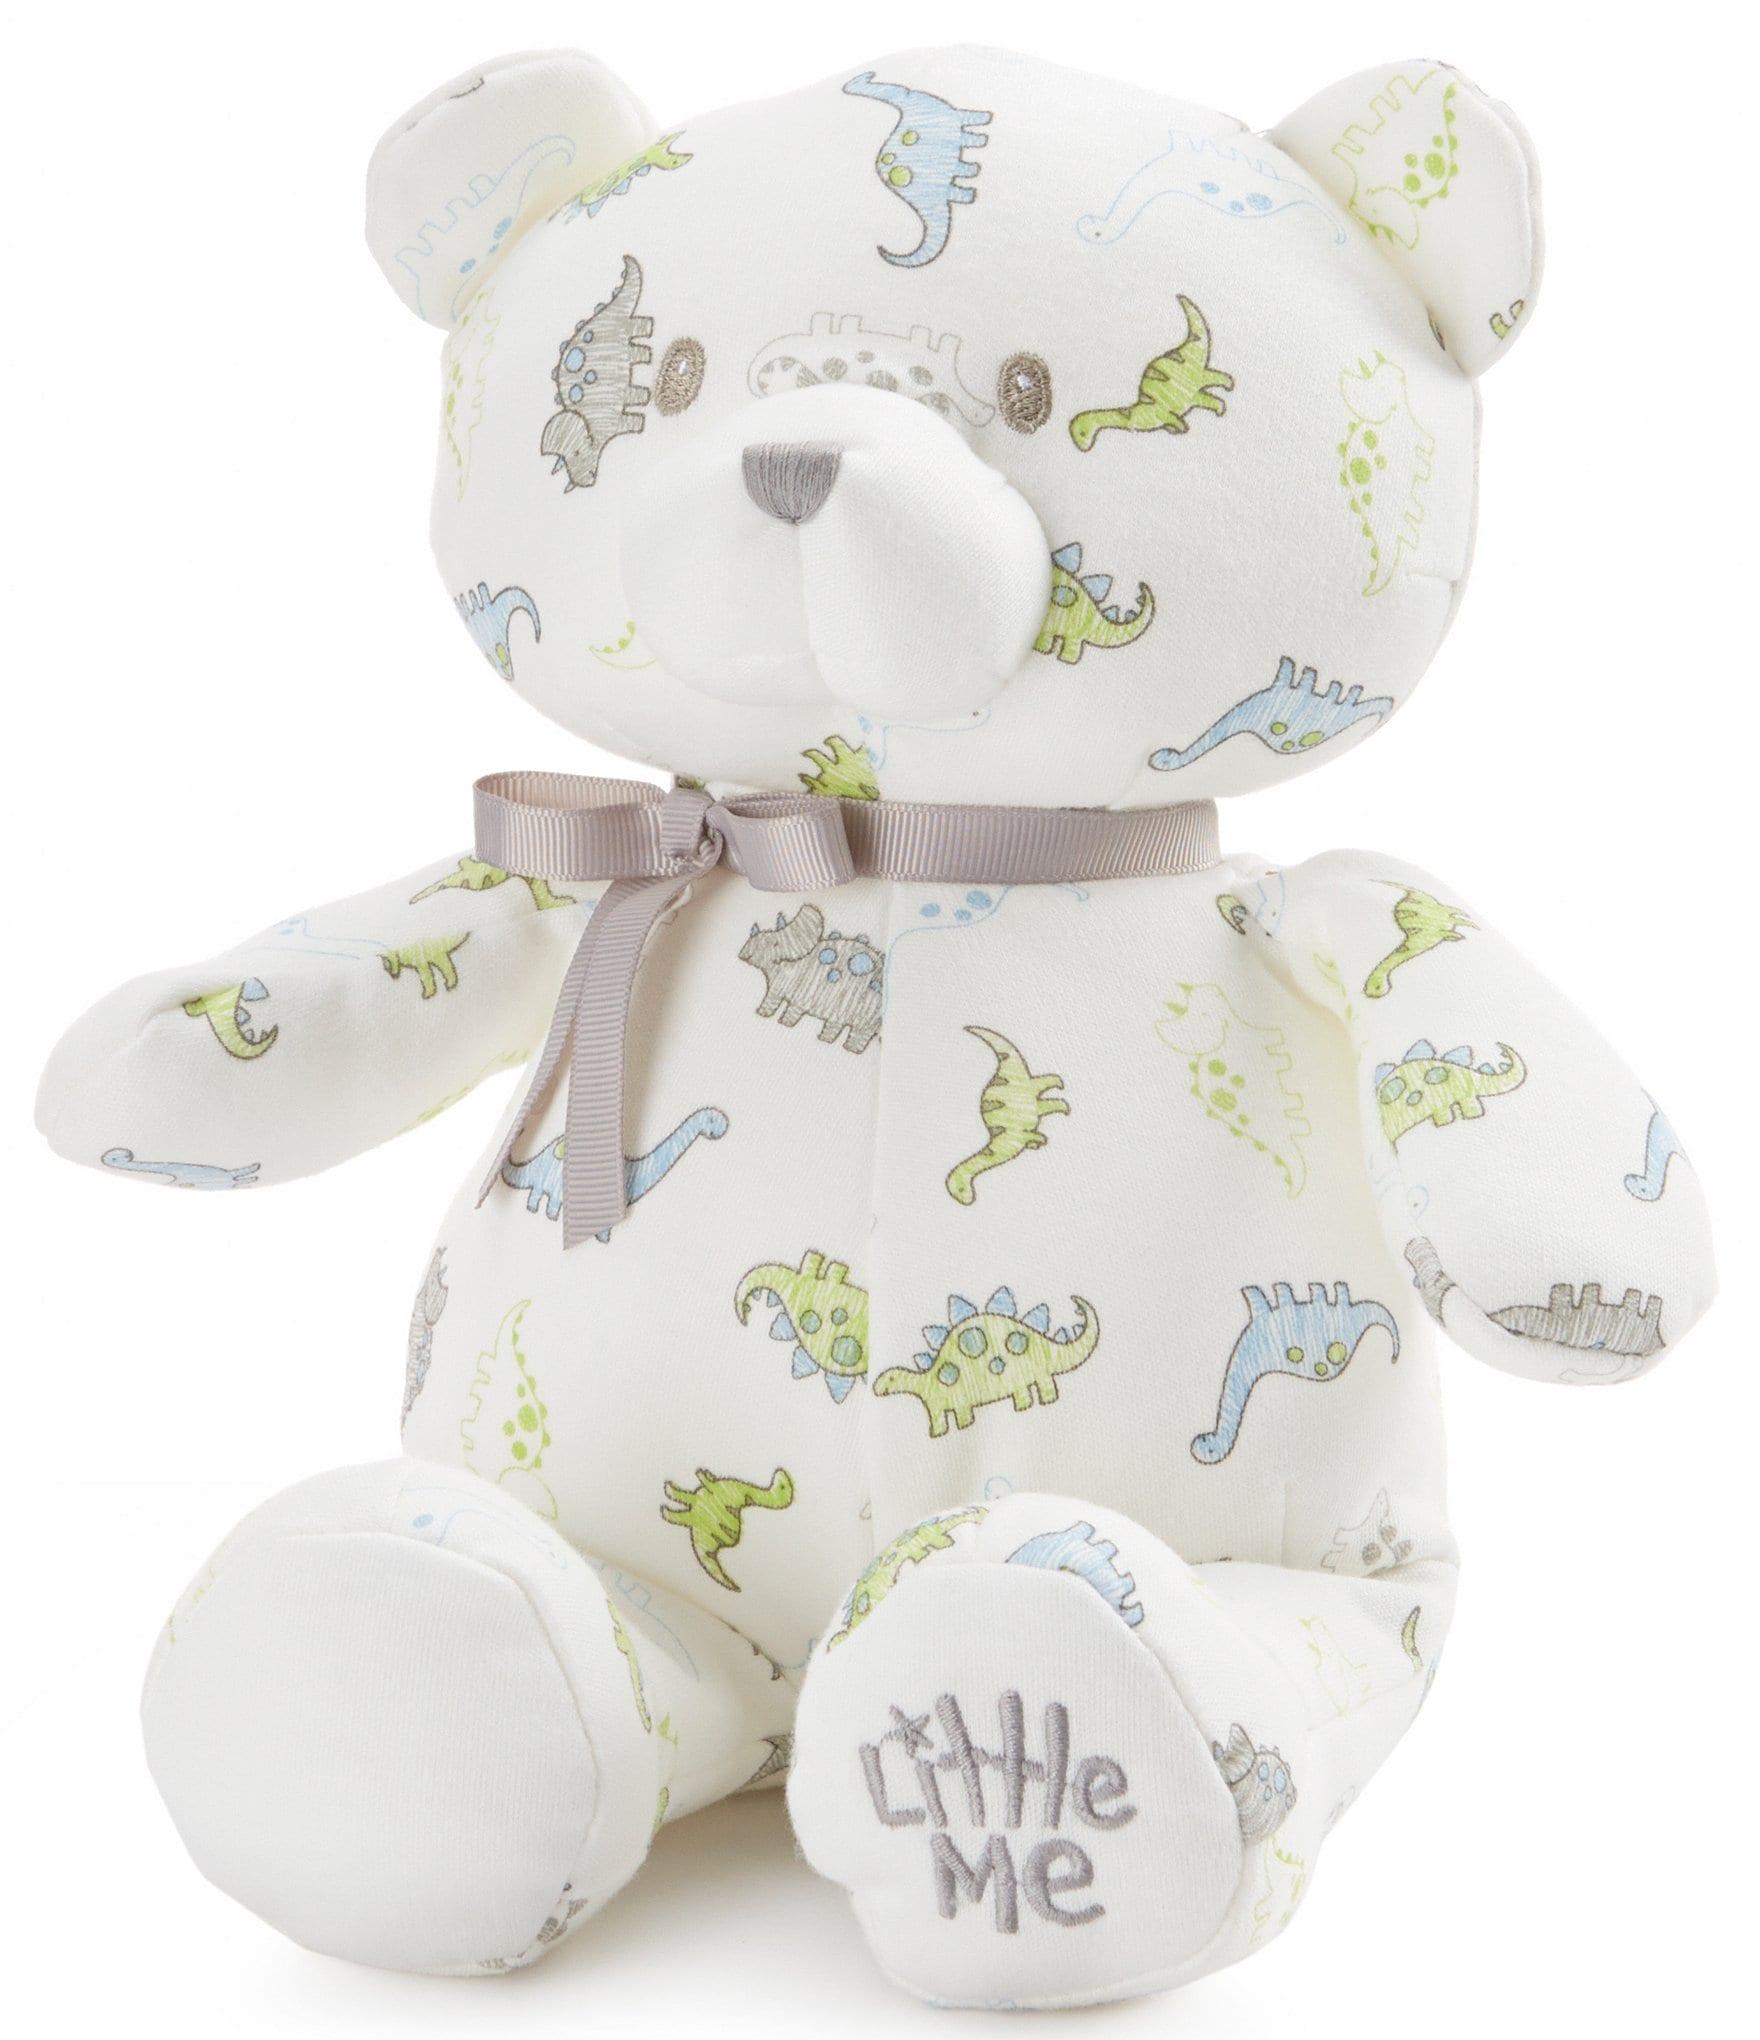 Little Me Baby Toys Plush Dillard S